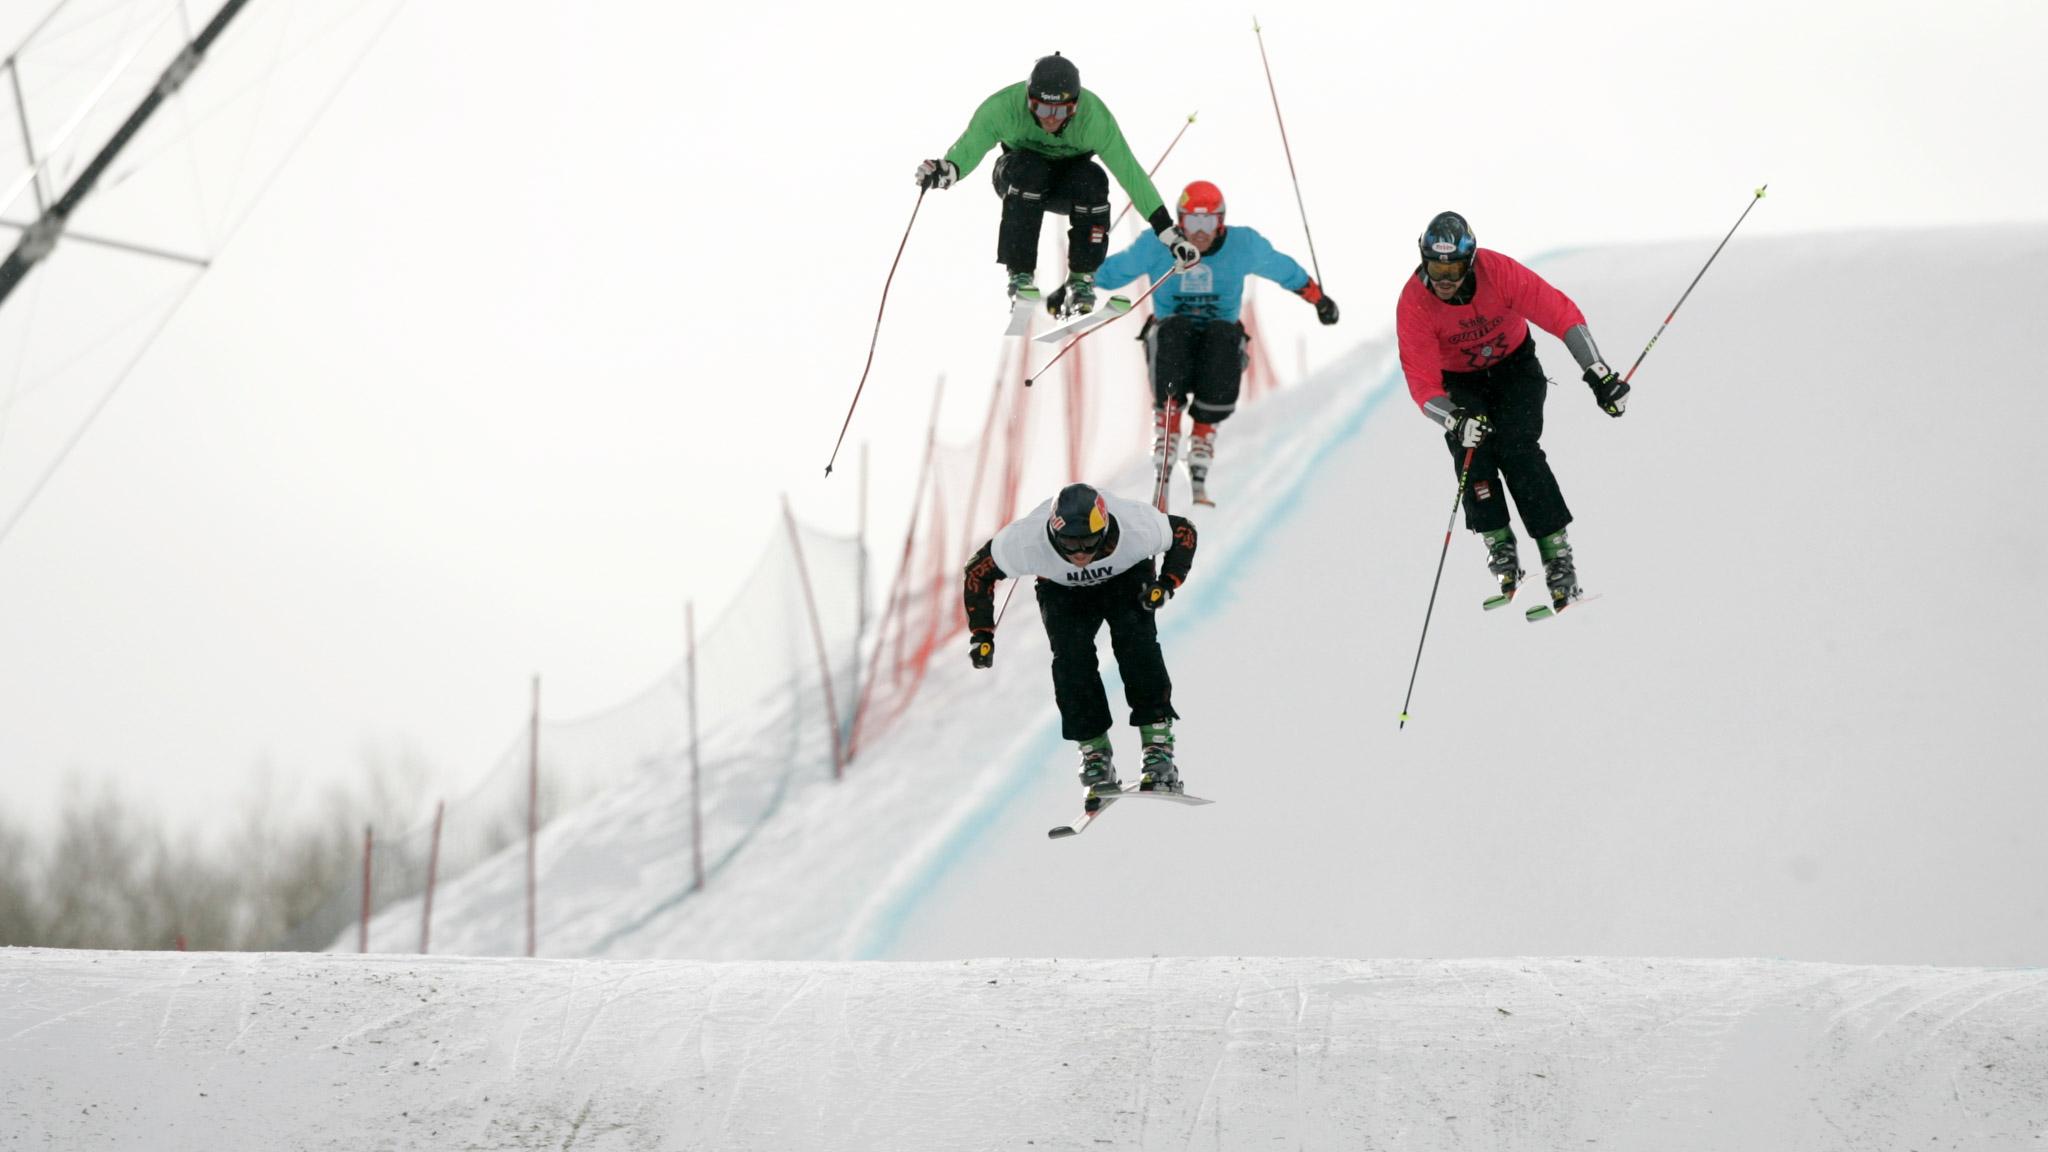 Aleisha Cline Canadian cross skier, medalist at Winter X Games